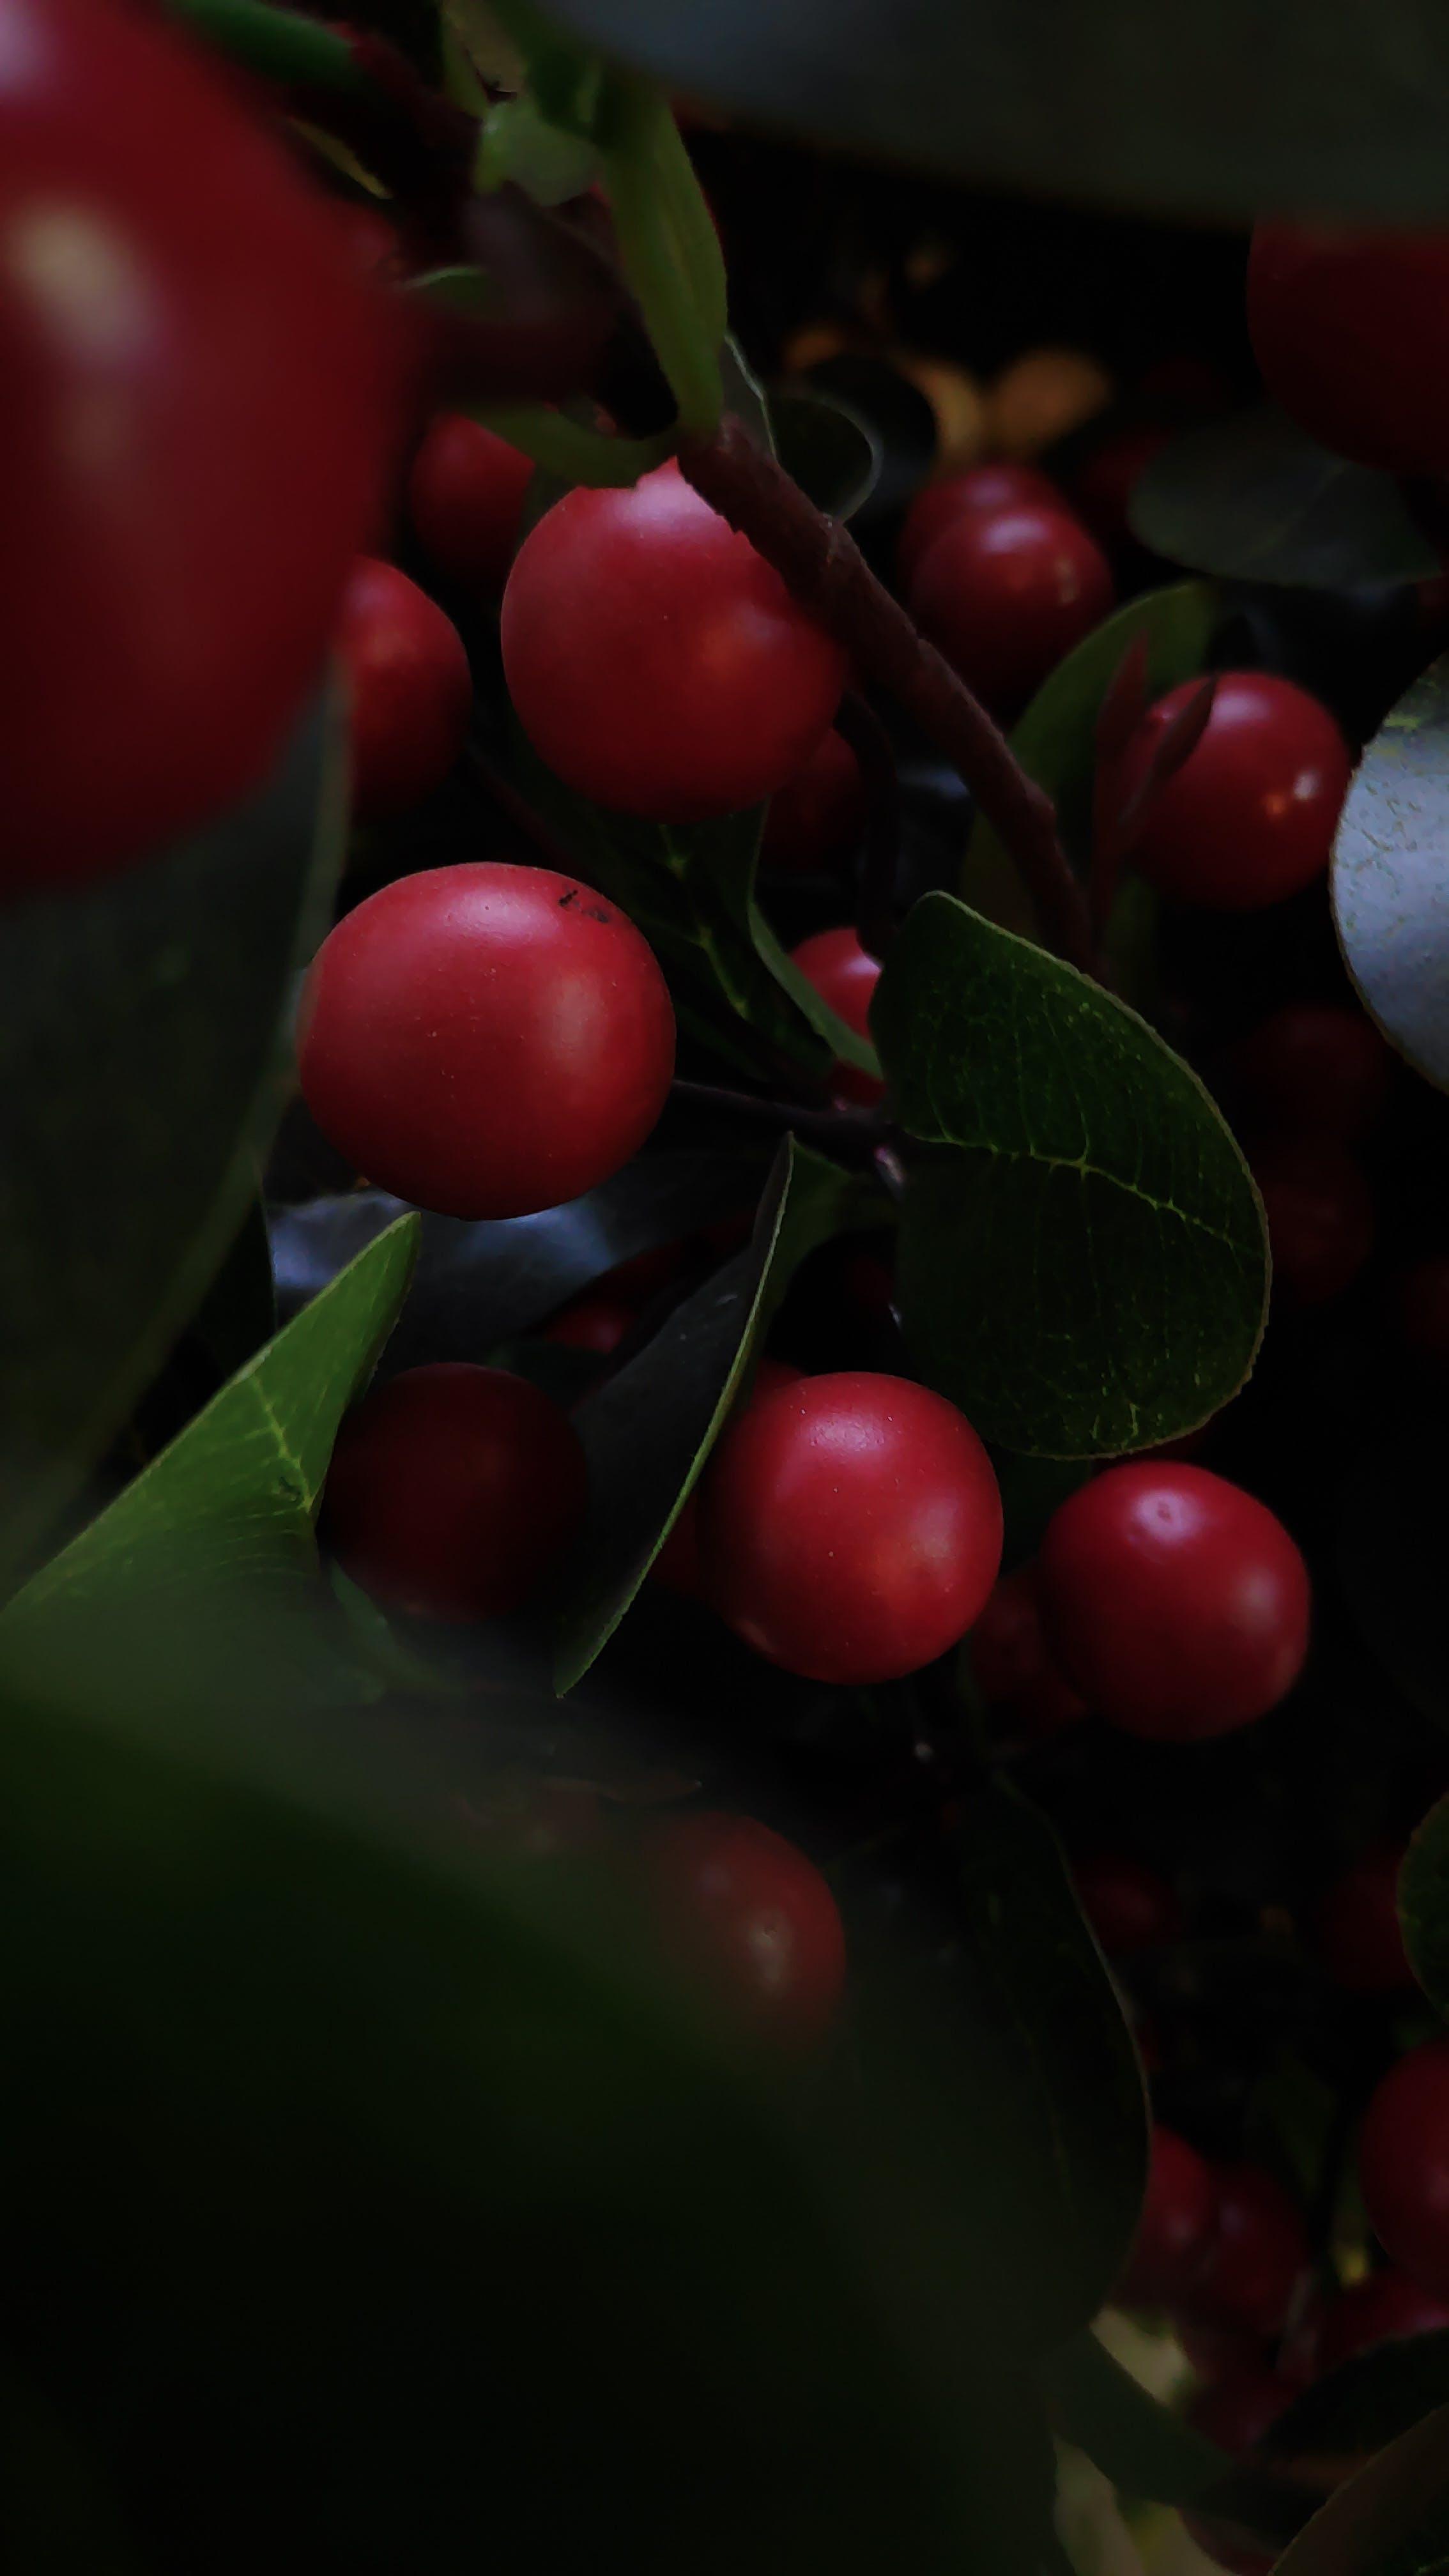 Free stock photo of cherry, dark, green leaf, red berries